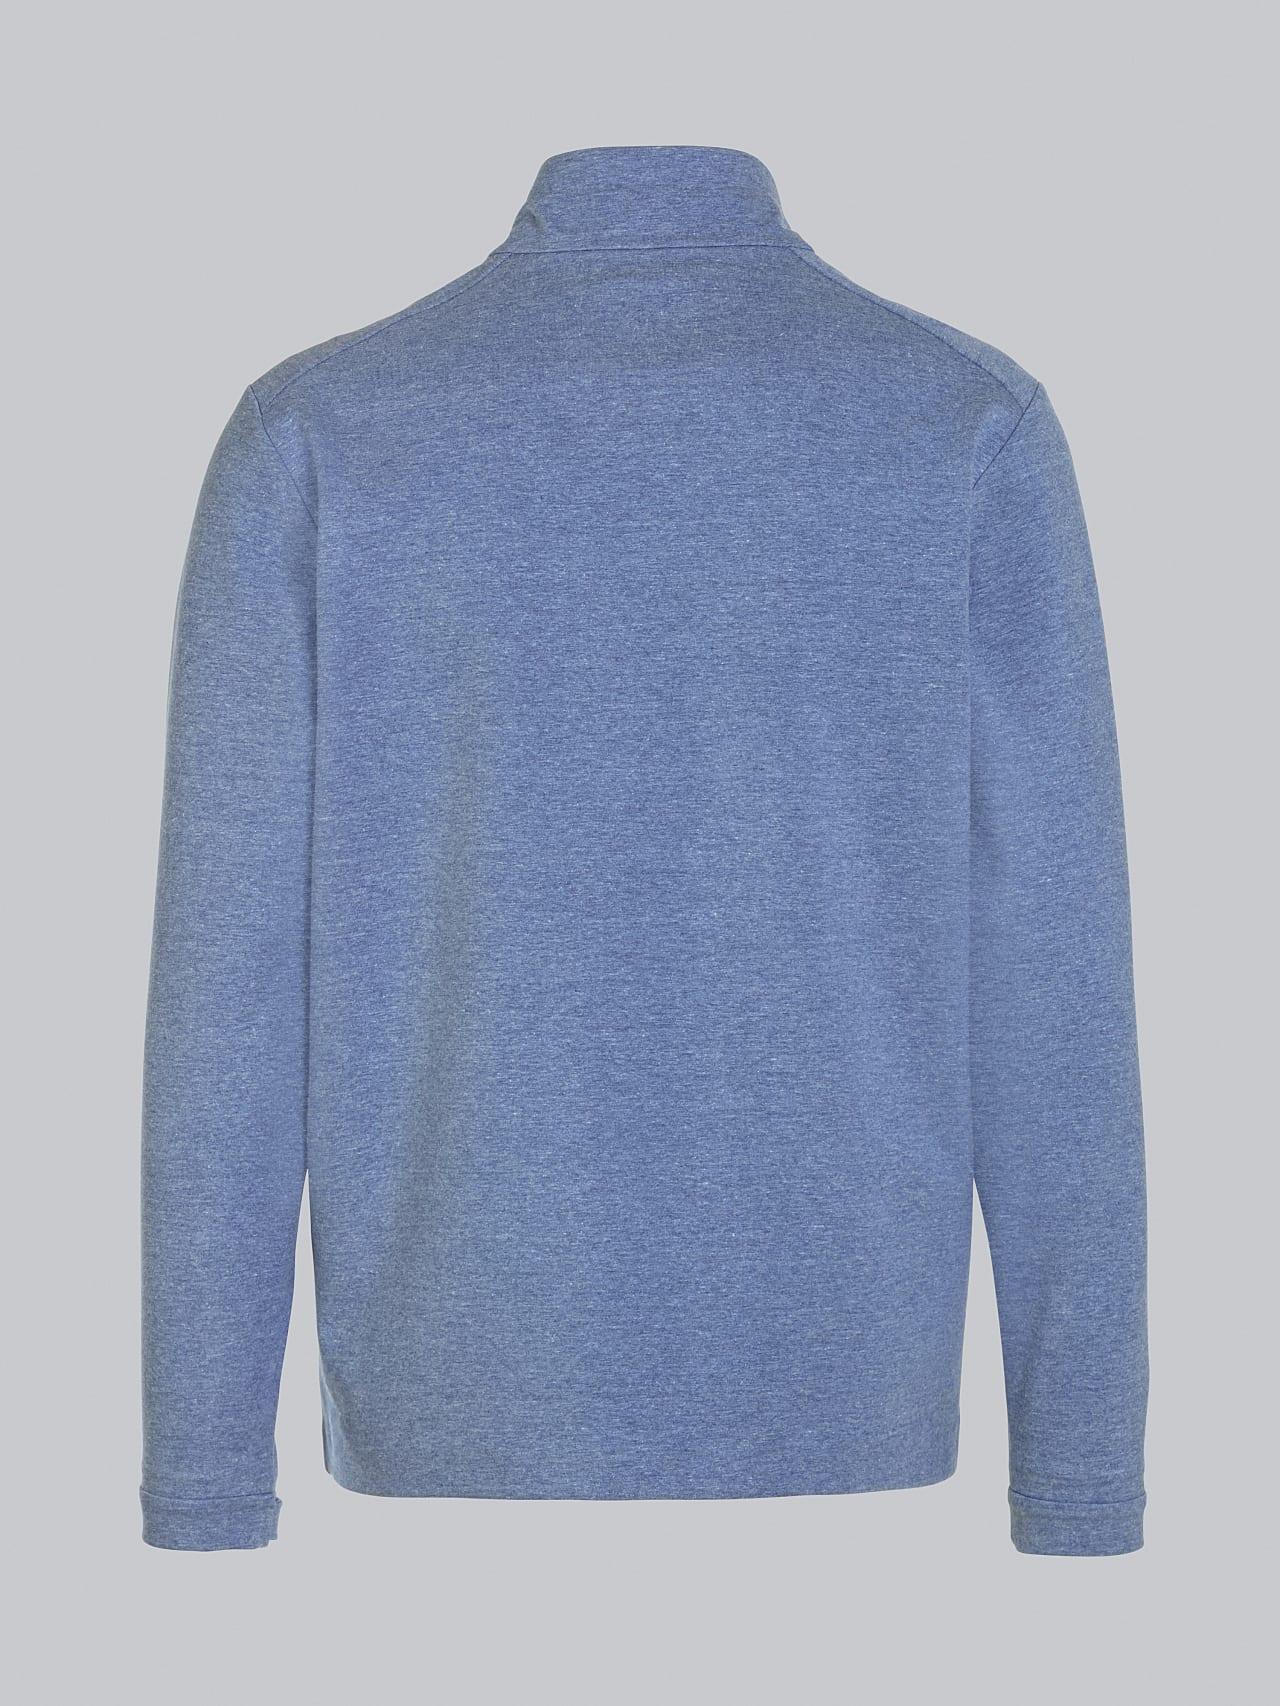 SROTO V1.Y5.02 Waterproof Half-Zip Sweatshirt medium blue Left Alpha Tauri